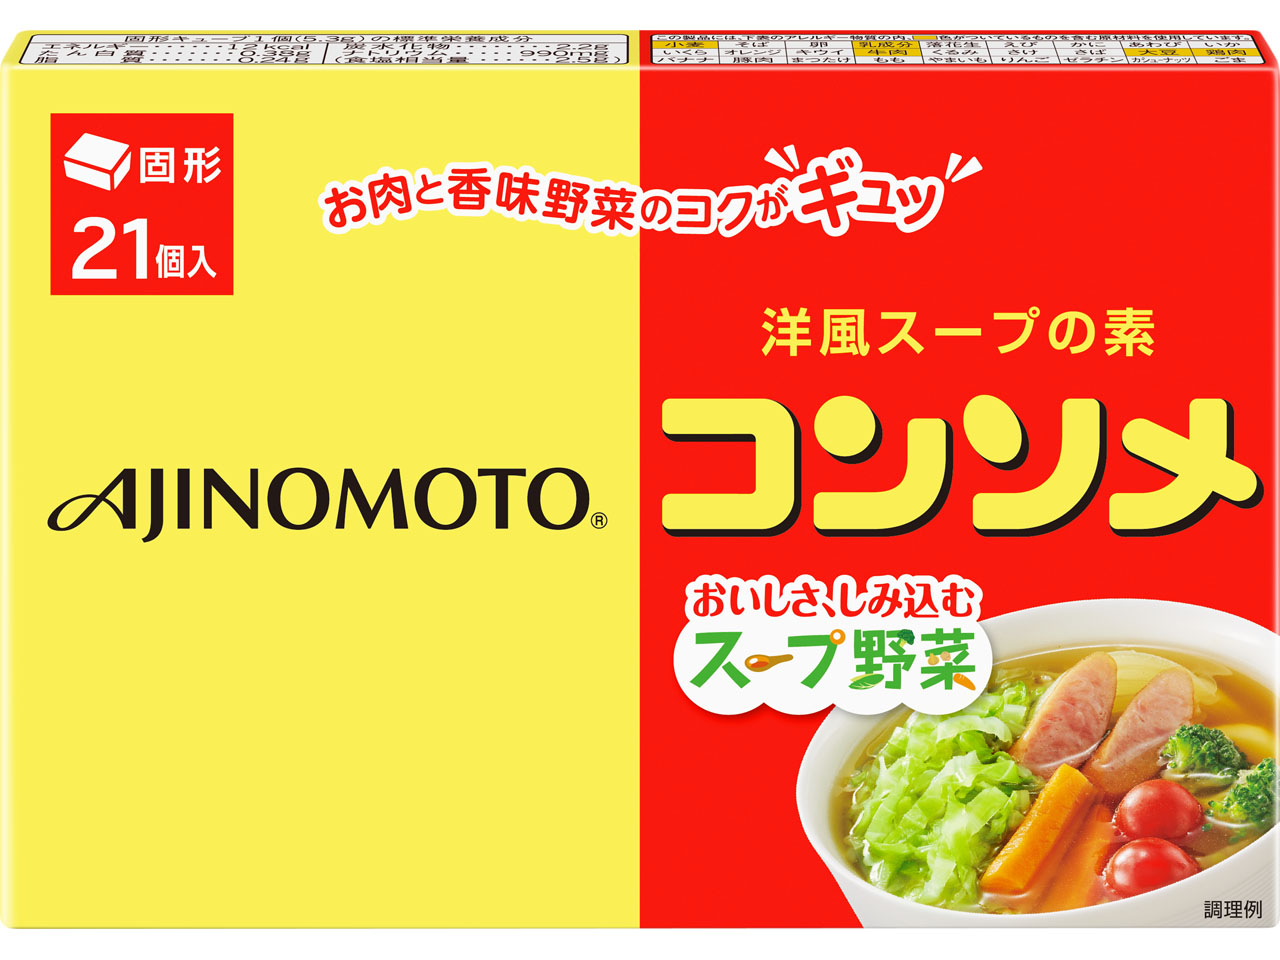 http://okyakusama.ajinomoto.co.jp/qa/konsome21.jpg